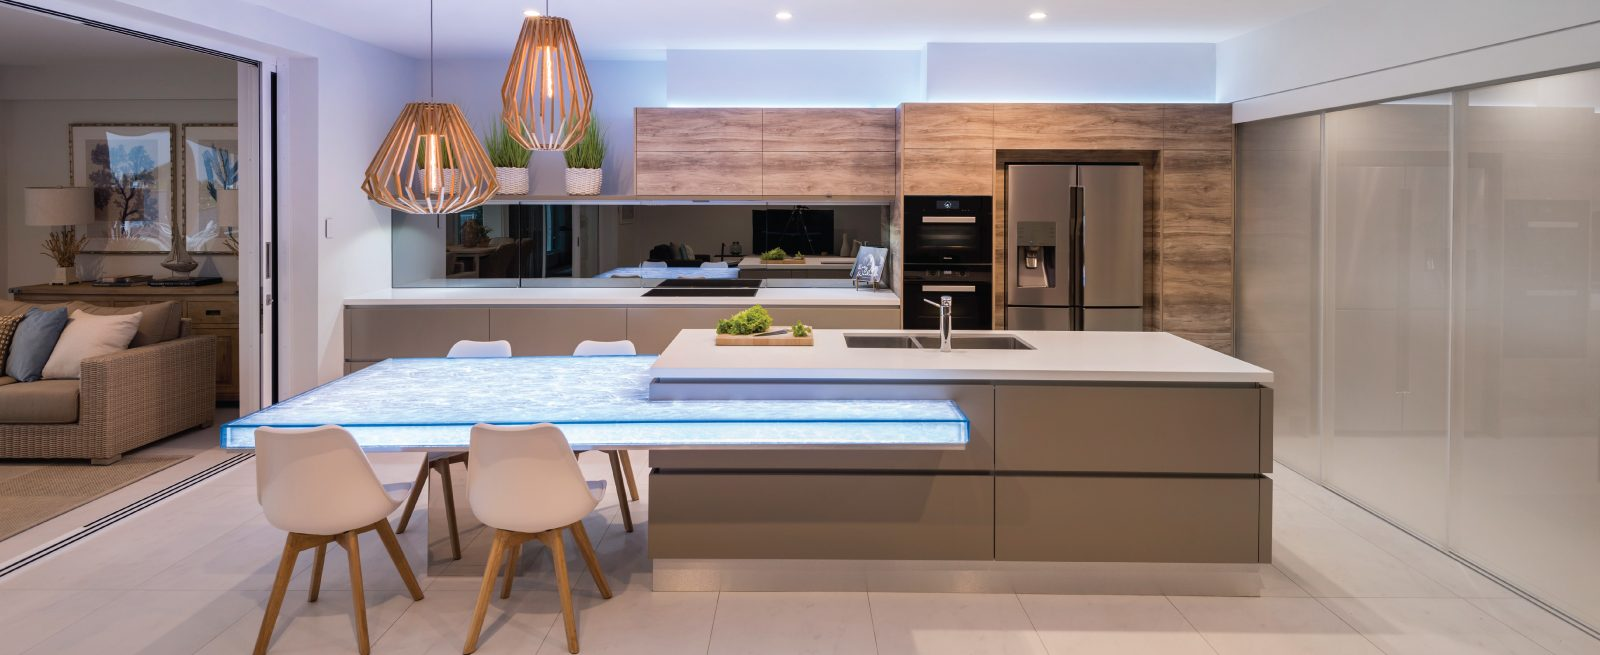 Luxury Kitchens Brisbane Australia